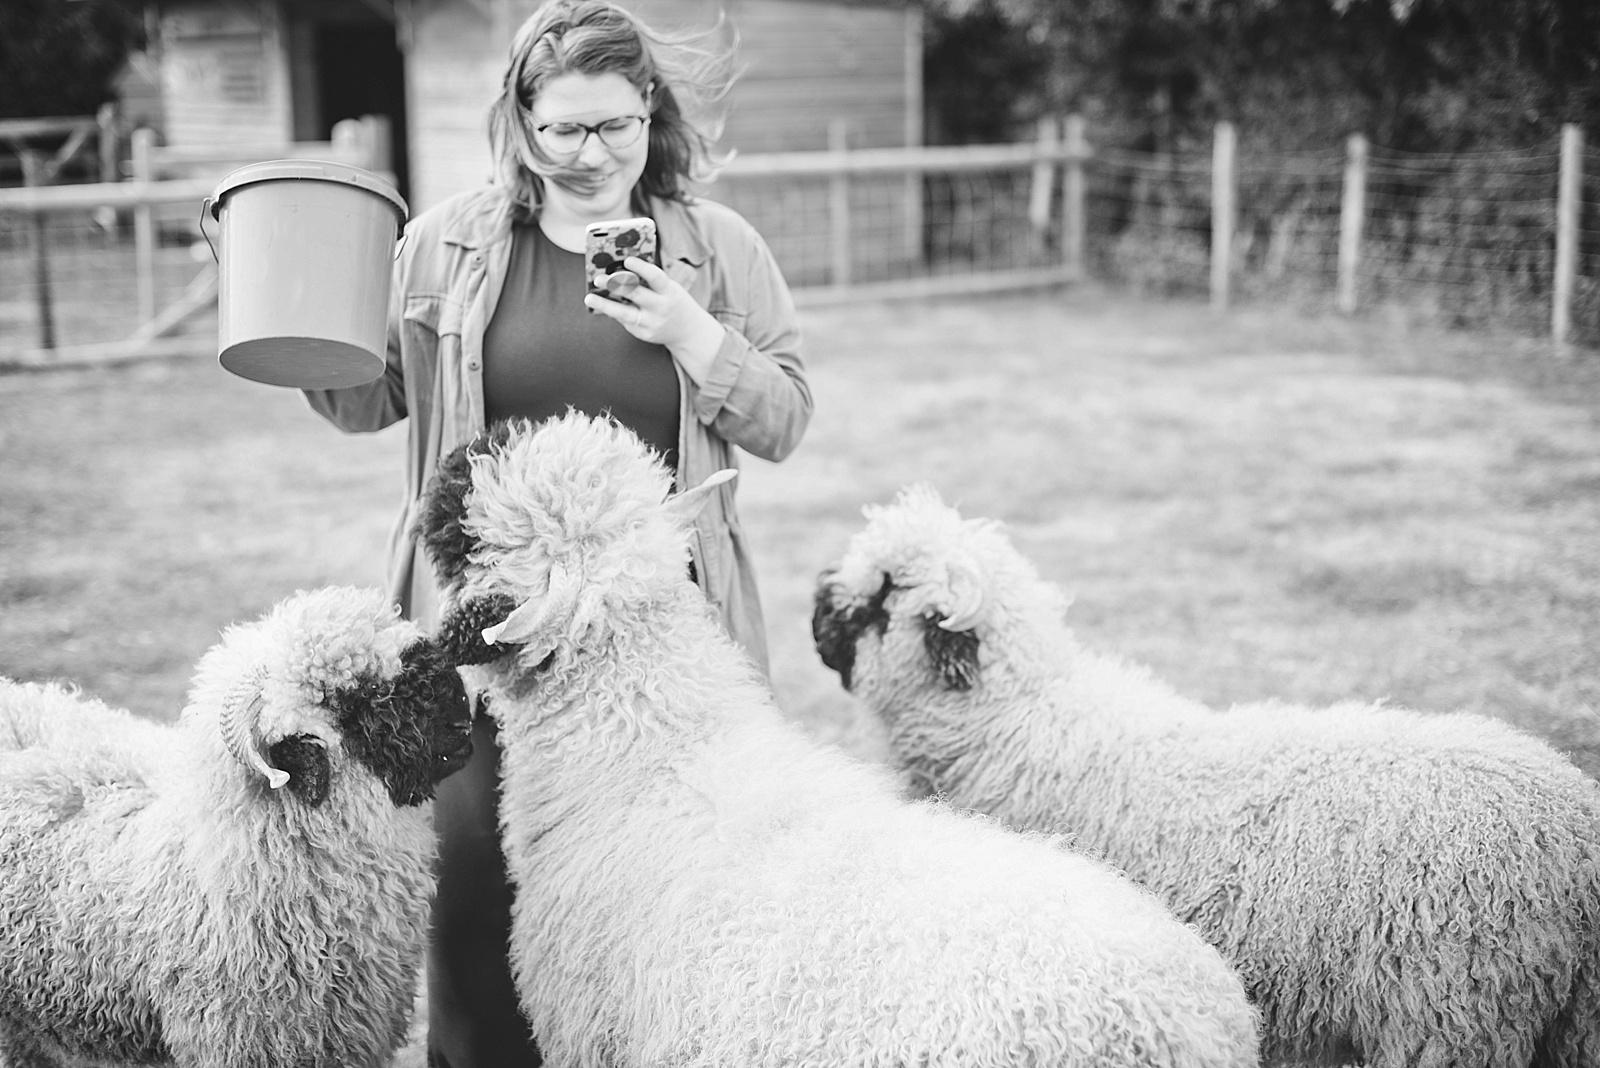 Valais Blacknose Sheep at The Sunshine Farm in Northampton England